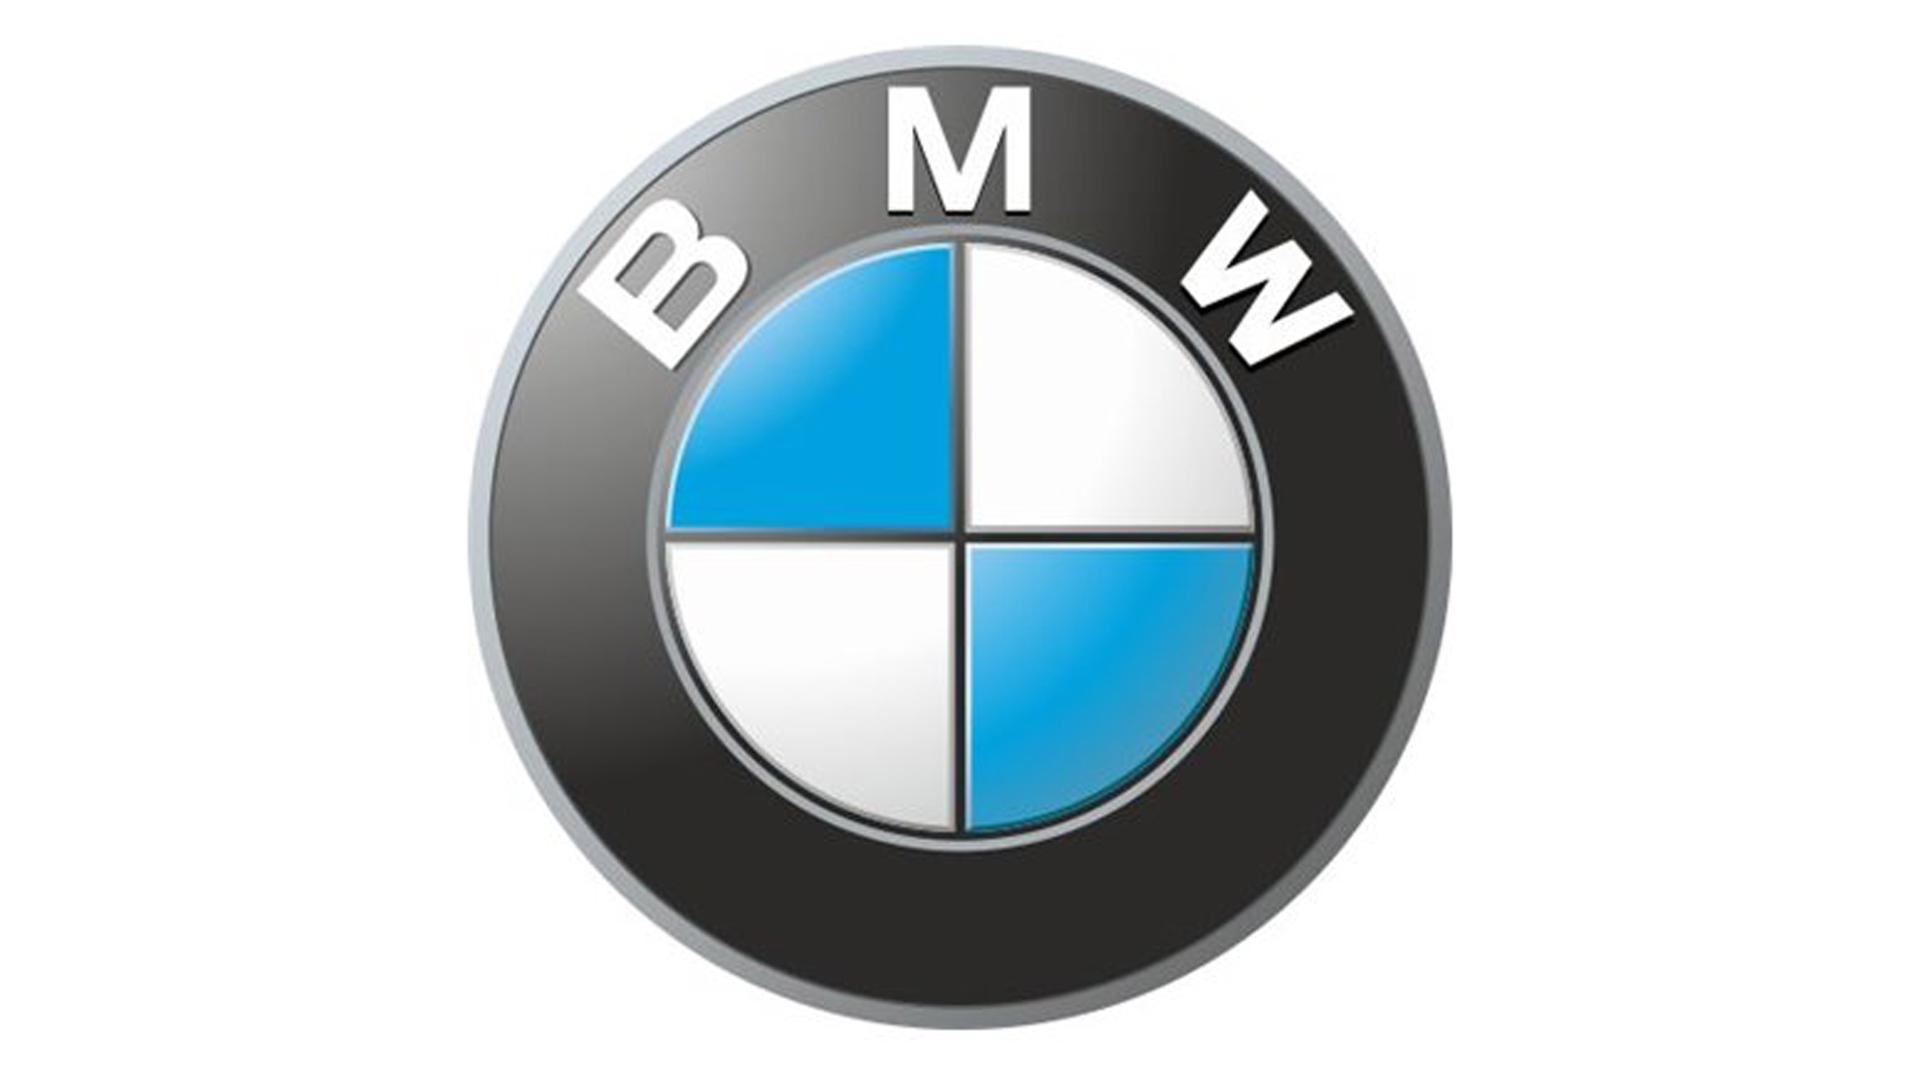 4CARS 3D CAR LOGO BMW